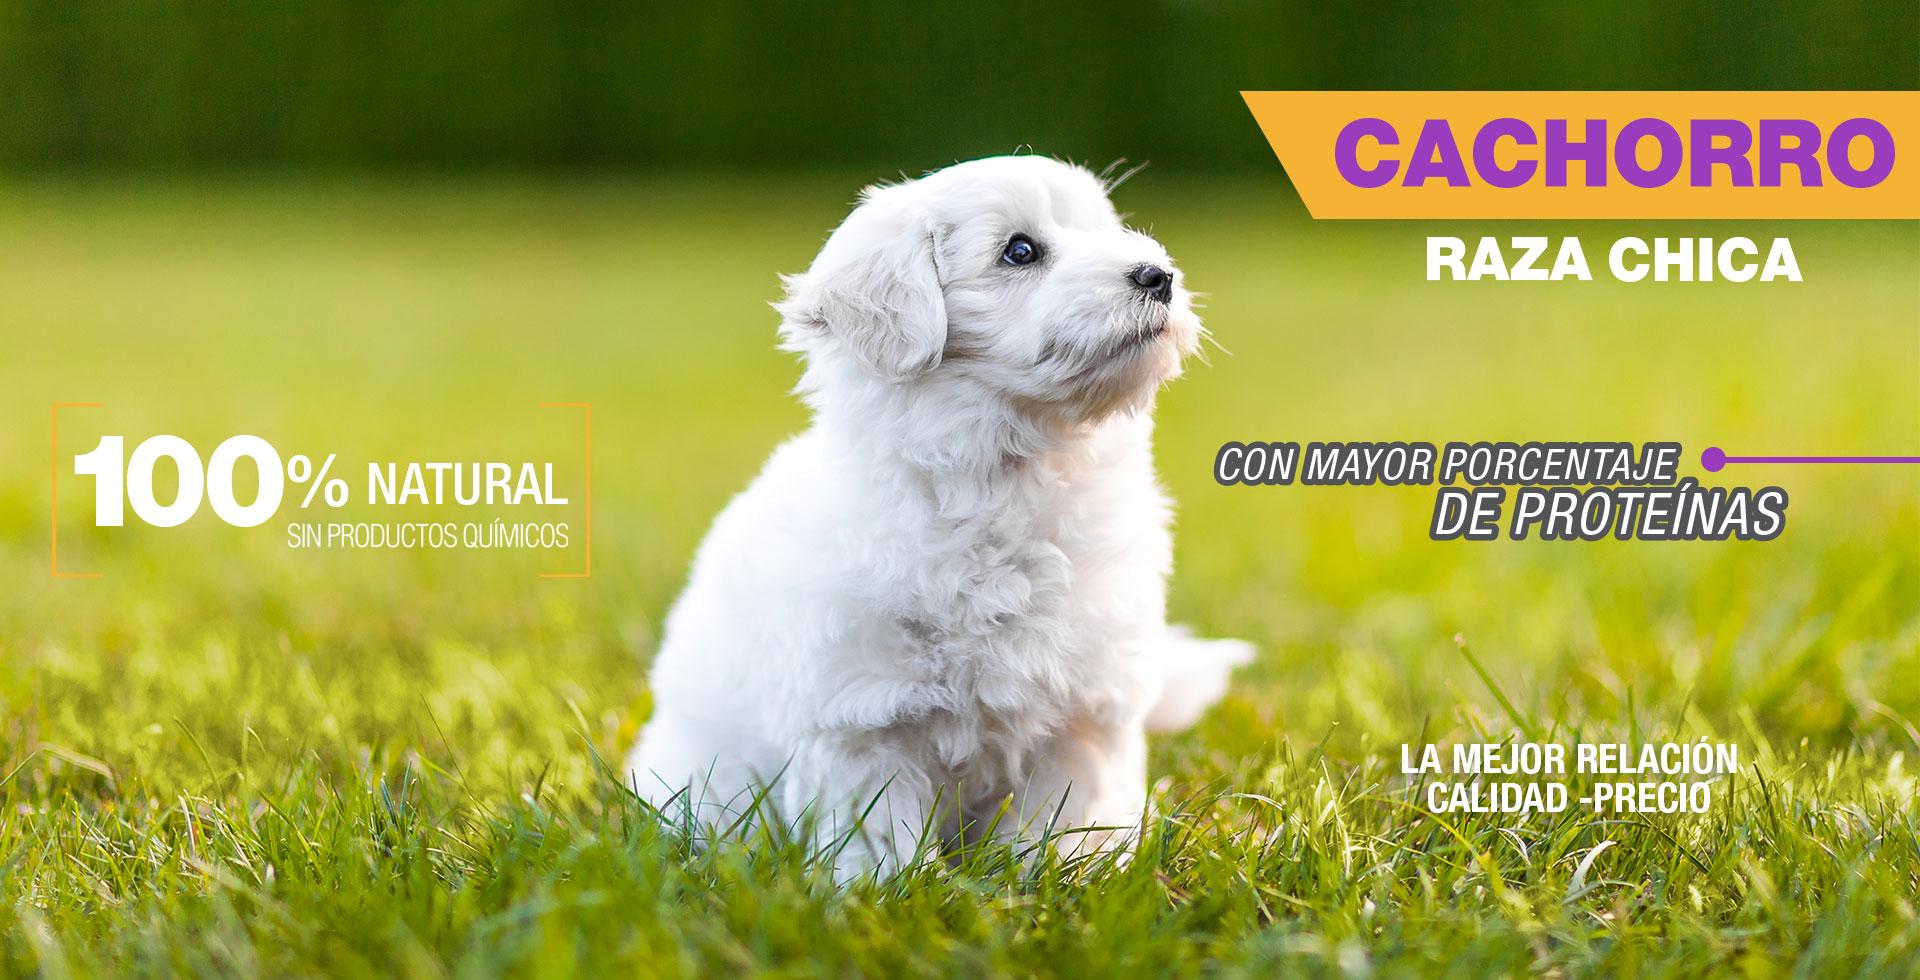 cachorro-chica-header-perfect-sense